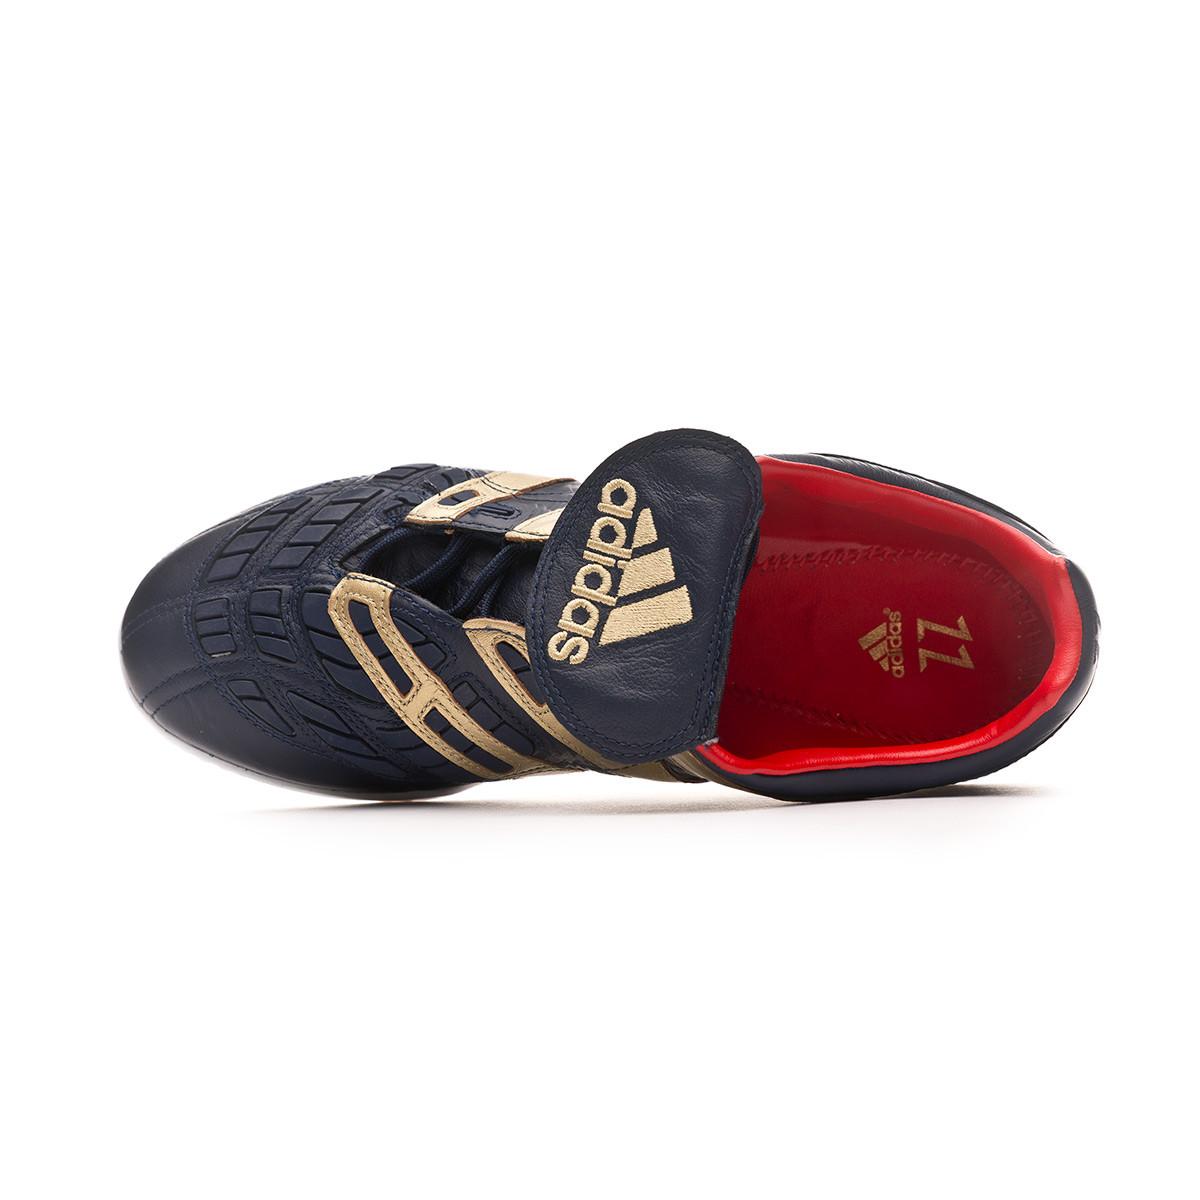 Adidas Predator Accelerator FG ZZ Football Boots